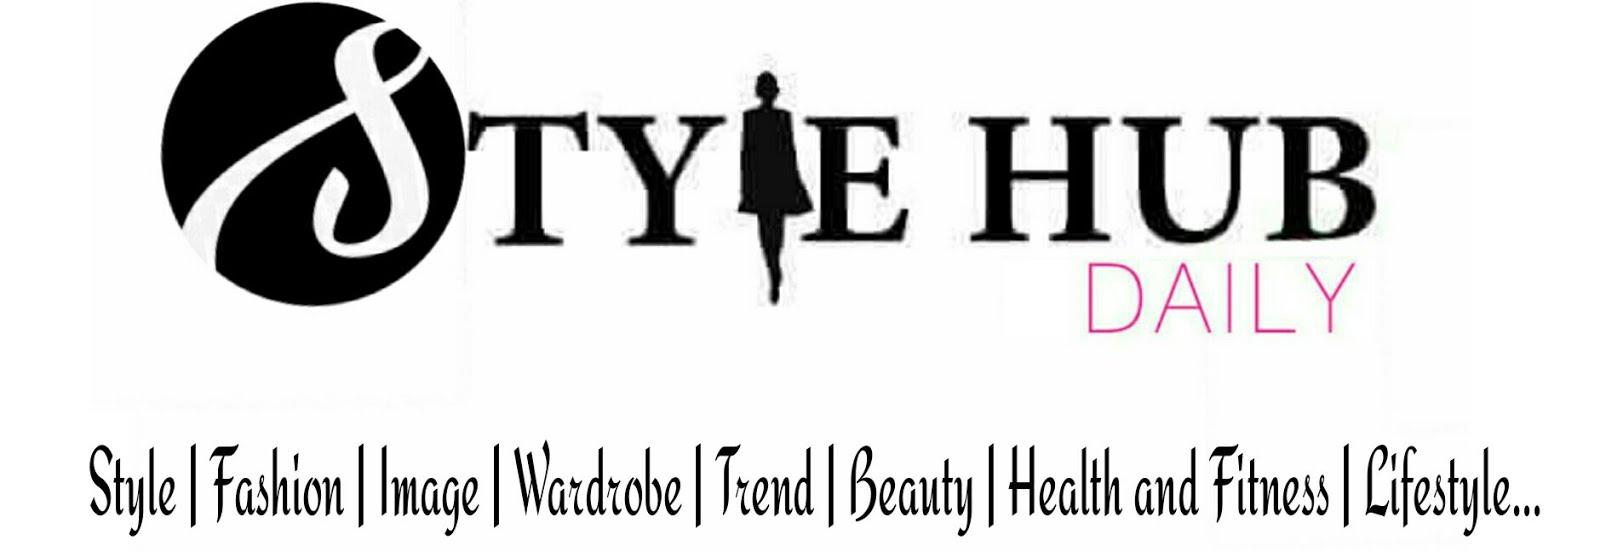 StyleHub Daily